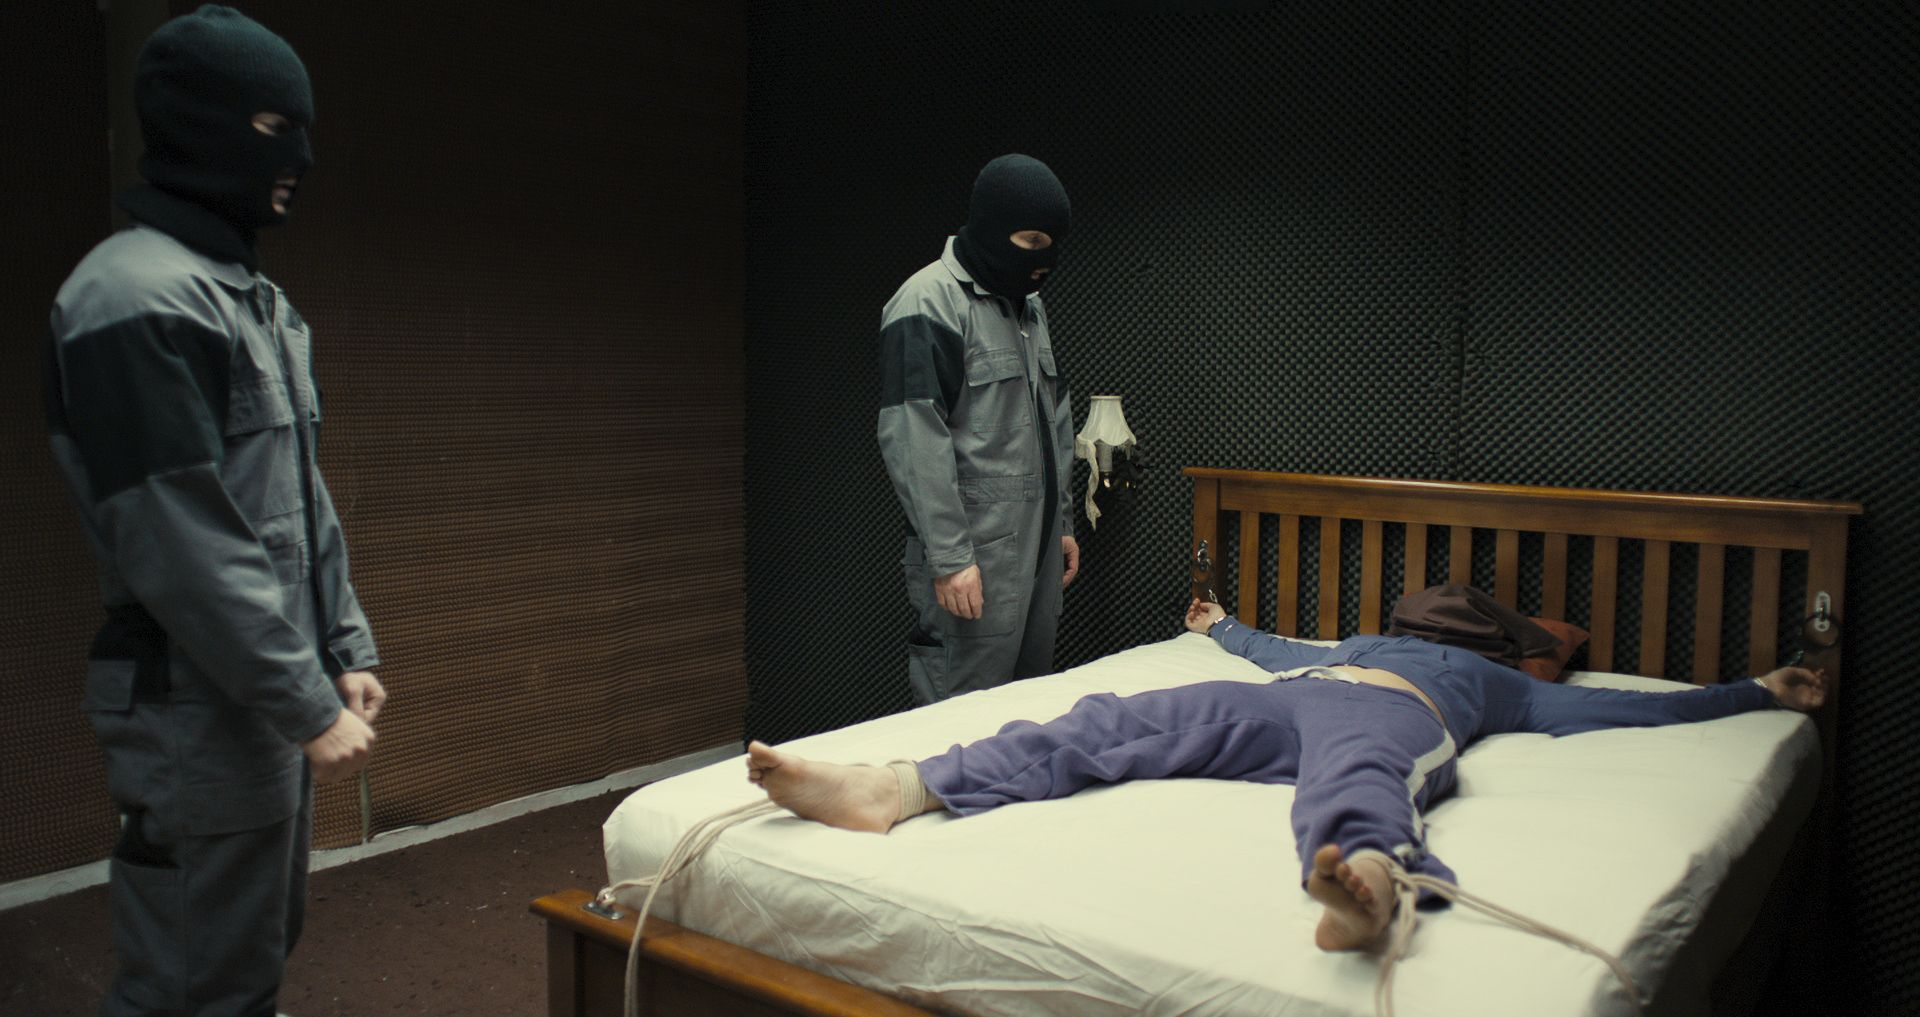 Фото мужчина привязан к кровати 21 фотография